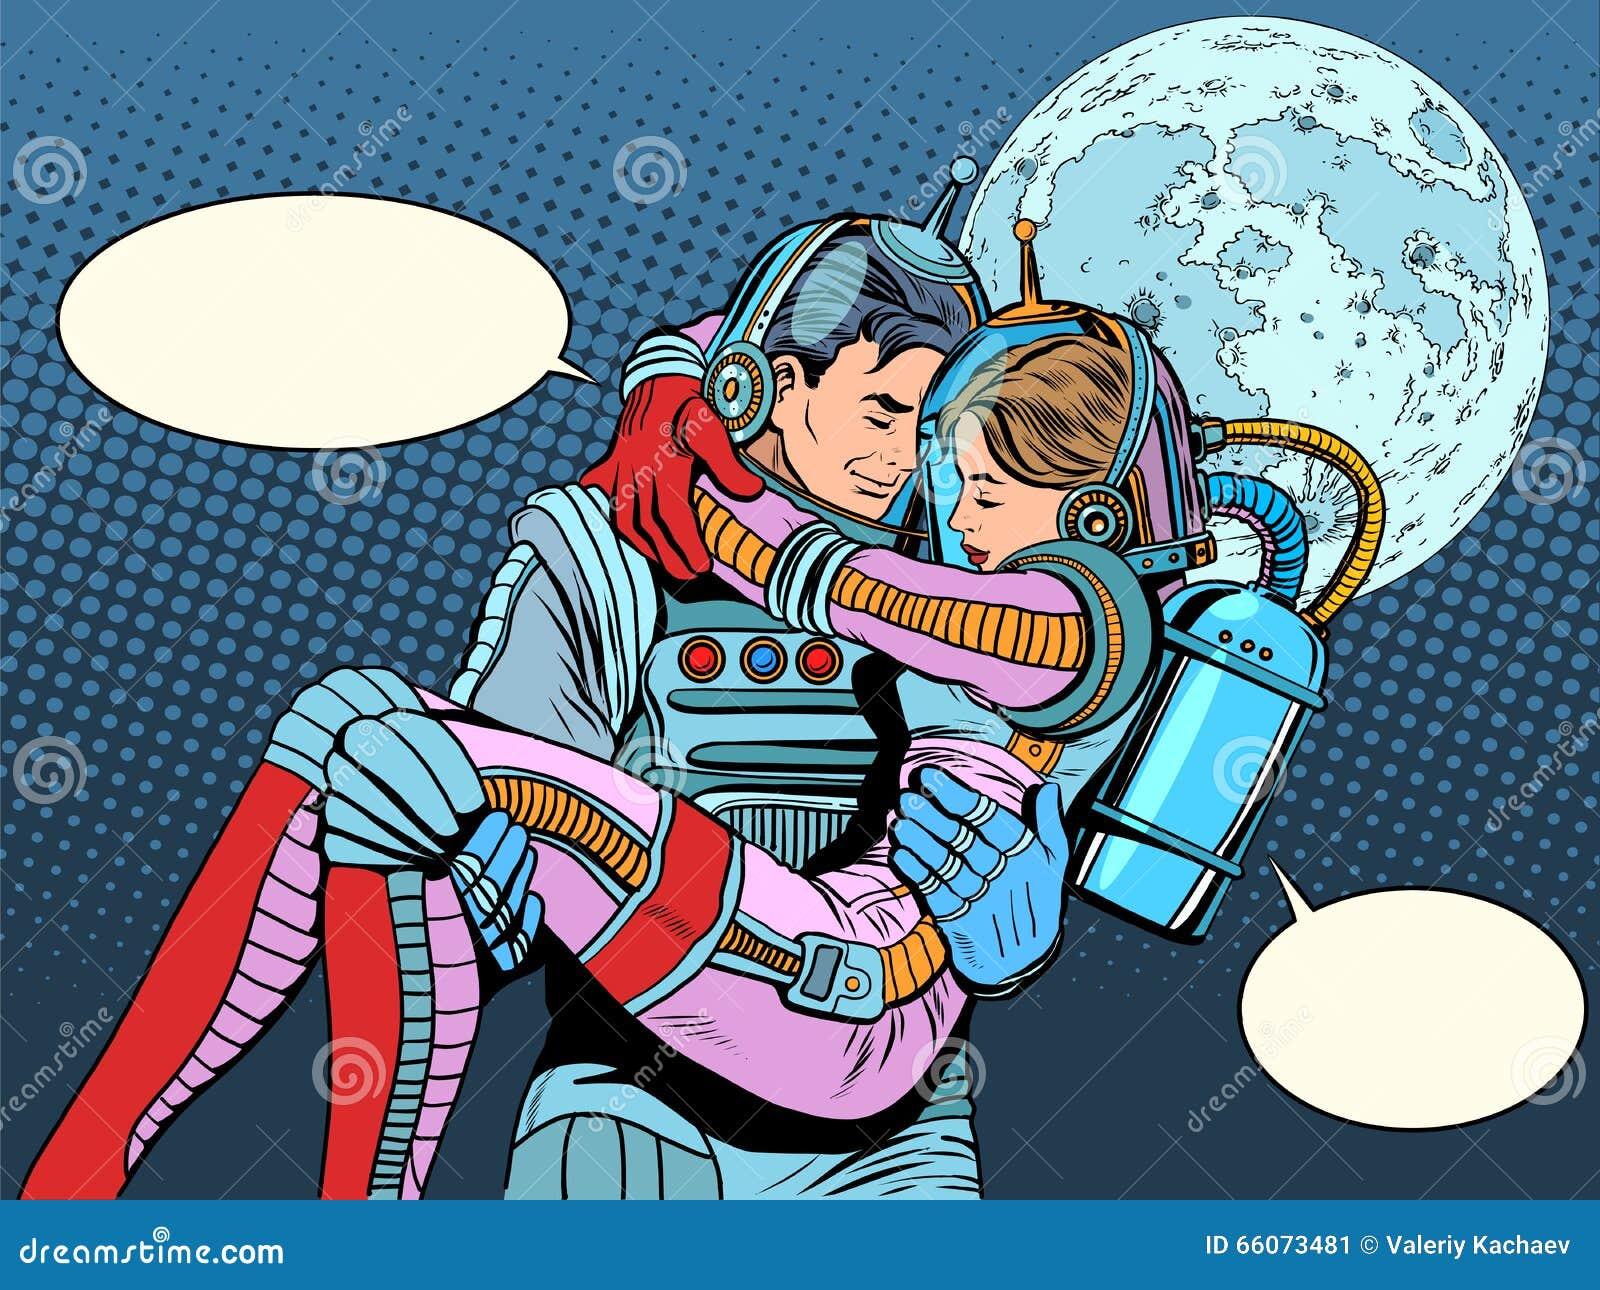 astronaut space love - photo #5